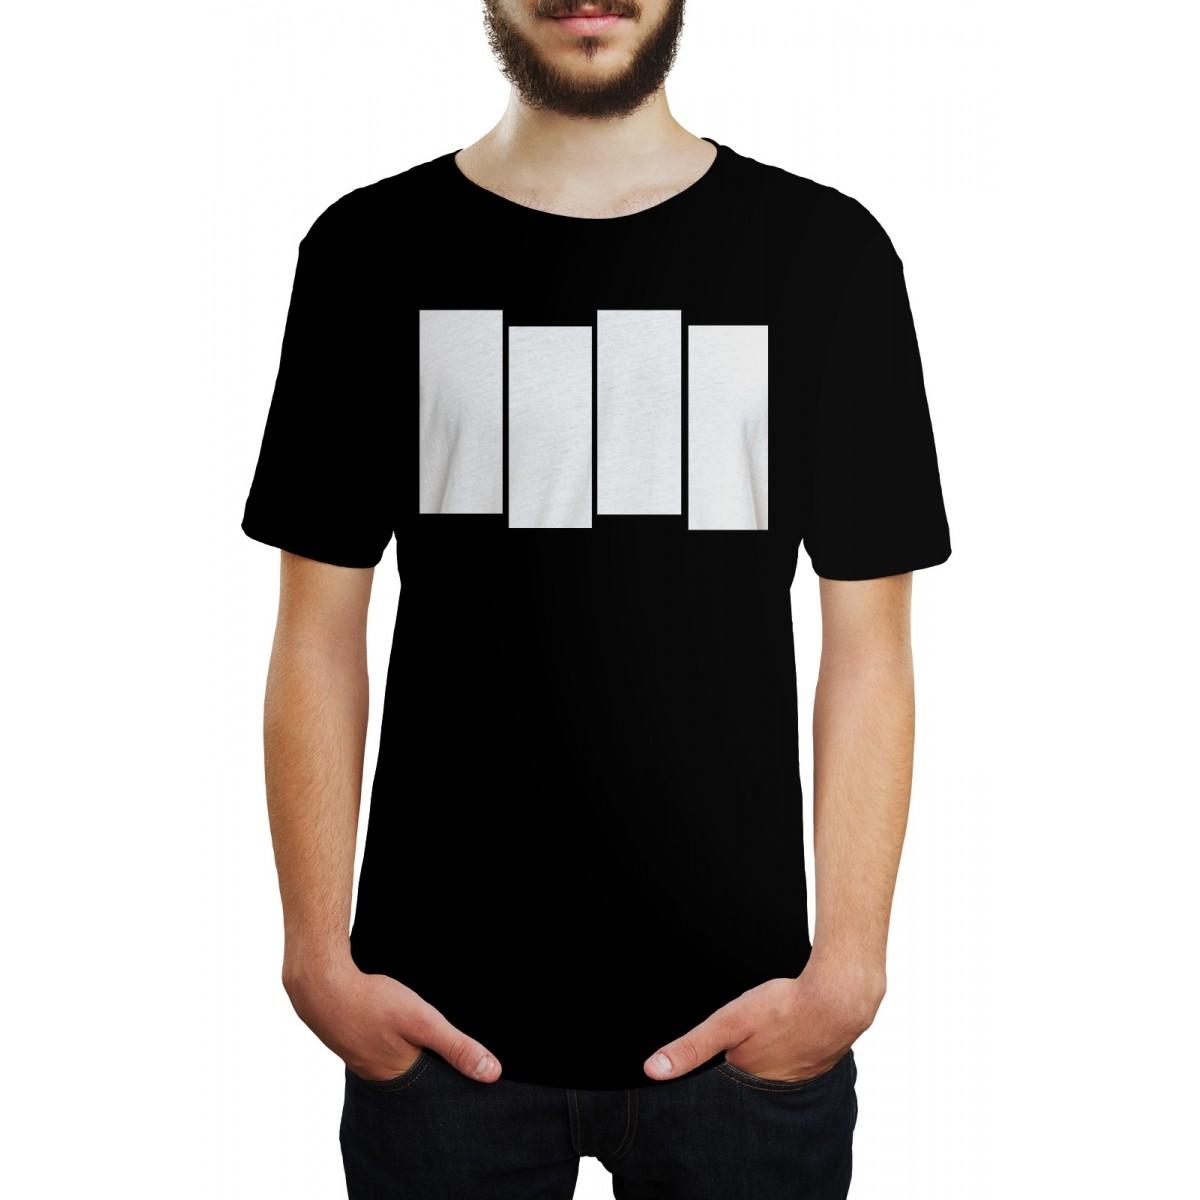 Camiseta Black Flag  - HShop